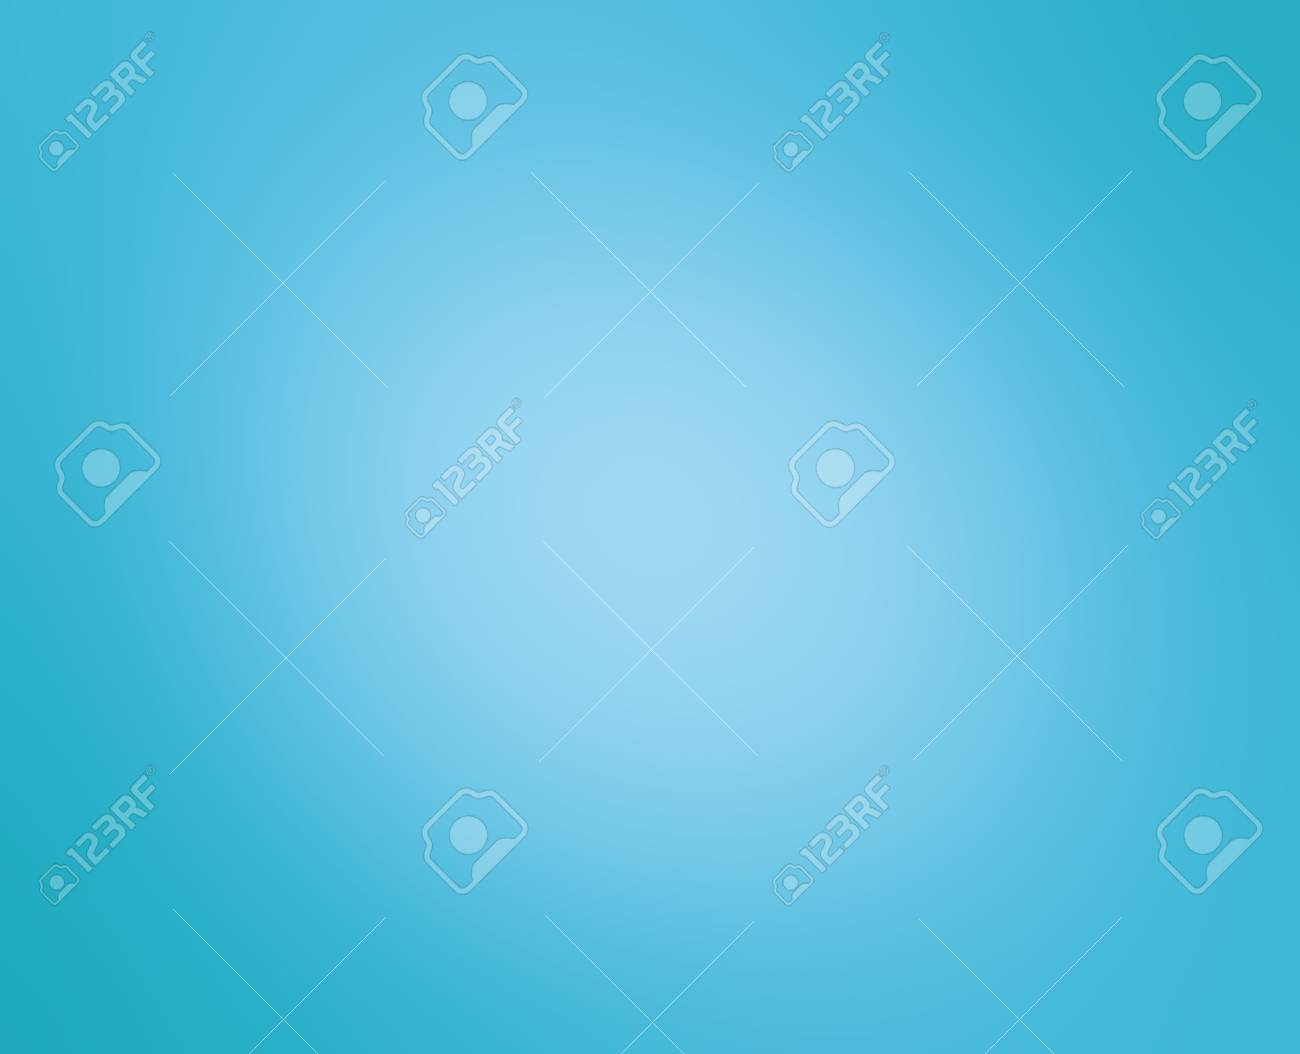 white blurred center on sky blue background color, gradient radial blur design - 74898677